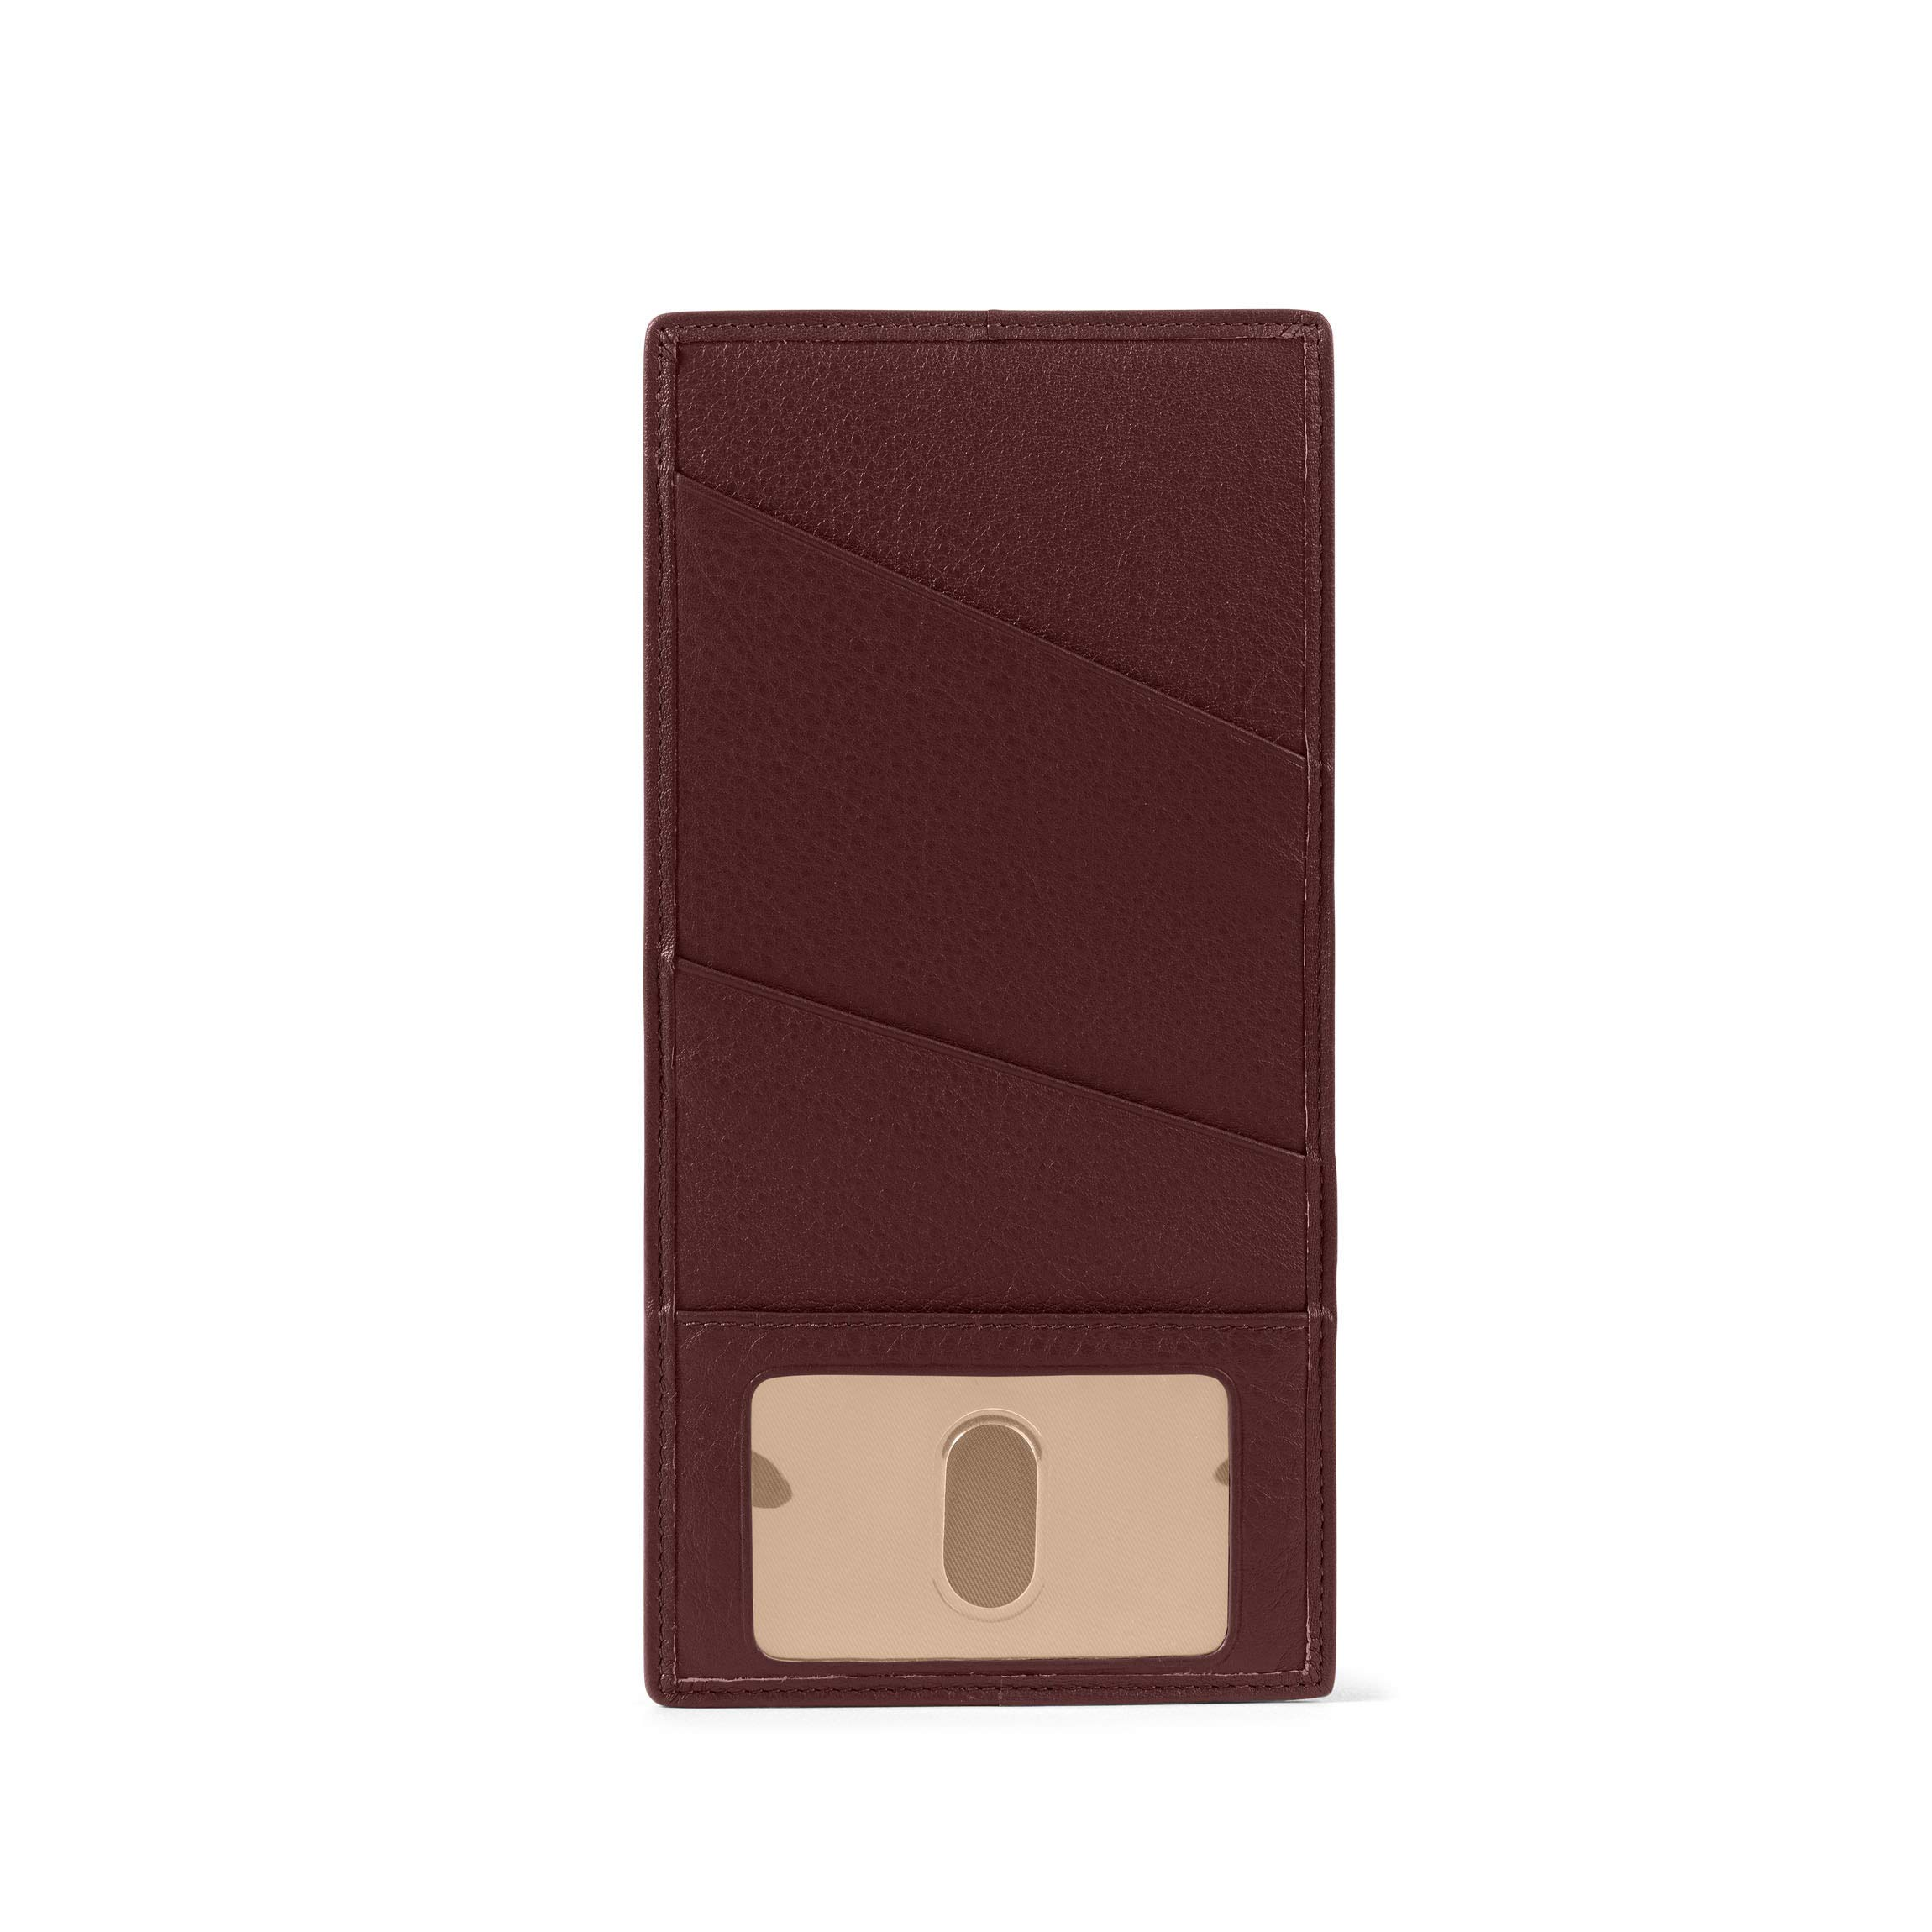 Slim Passport Ticket Holder - Full Grain Leather Leather - Bordeaux (Red)